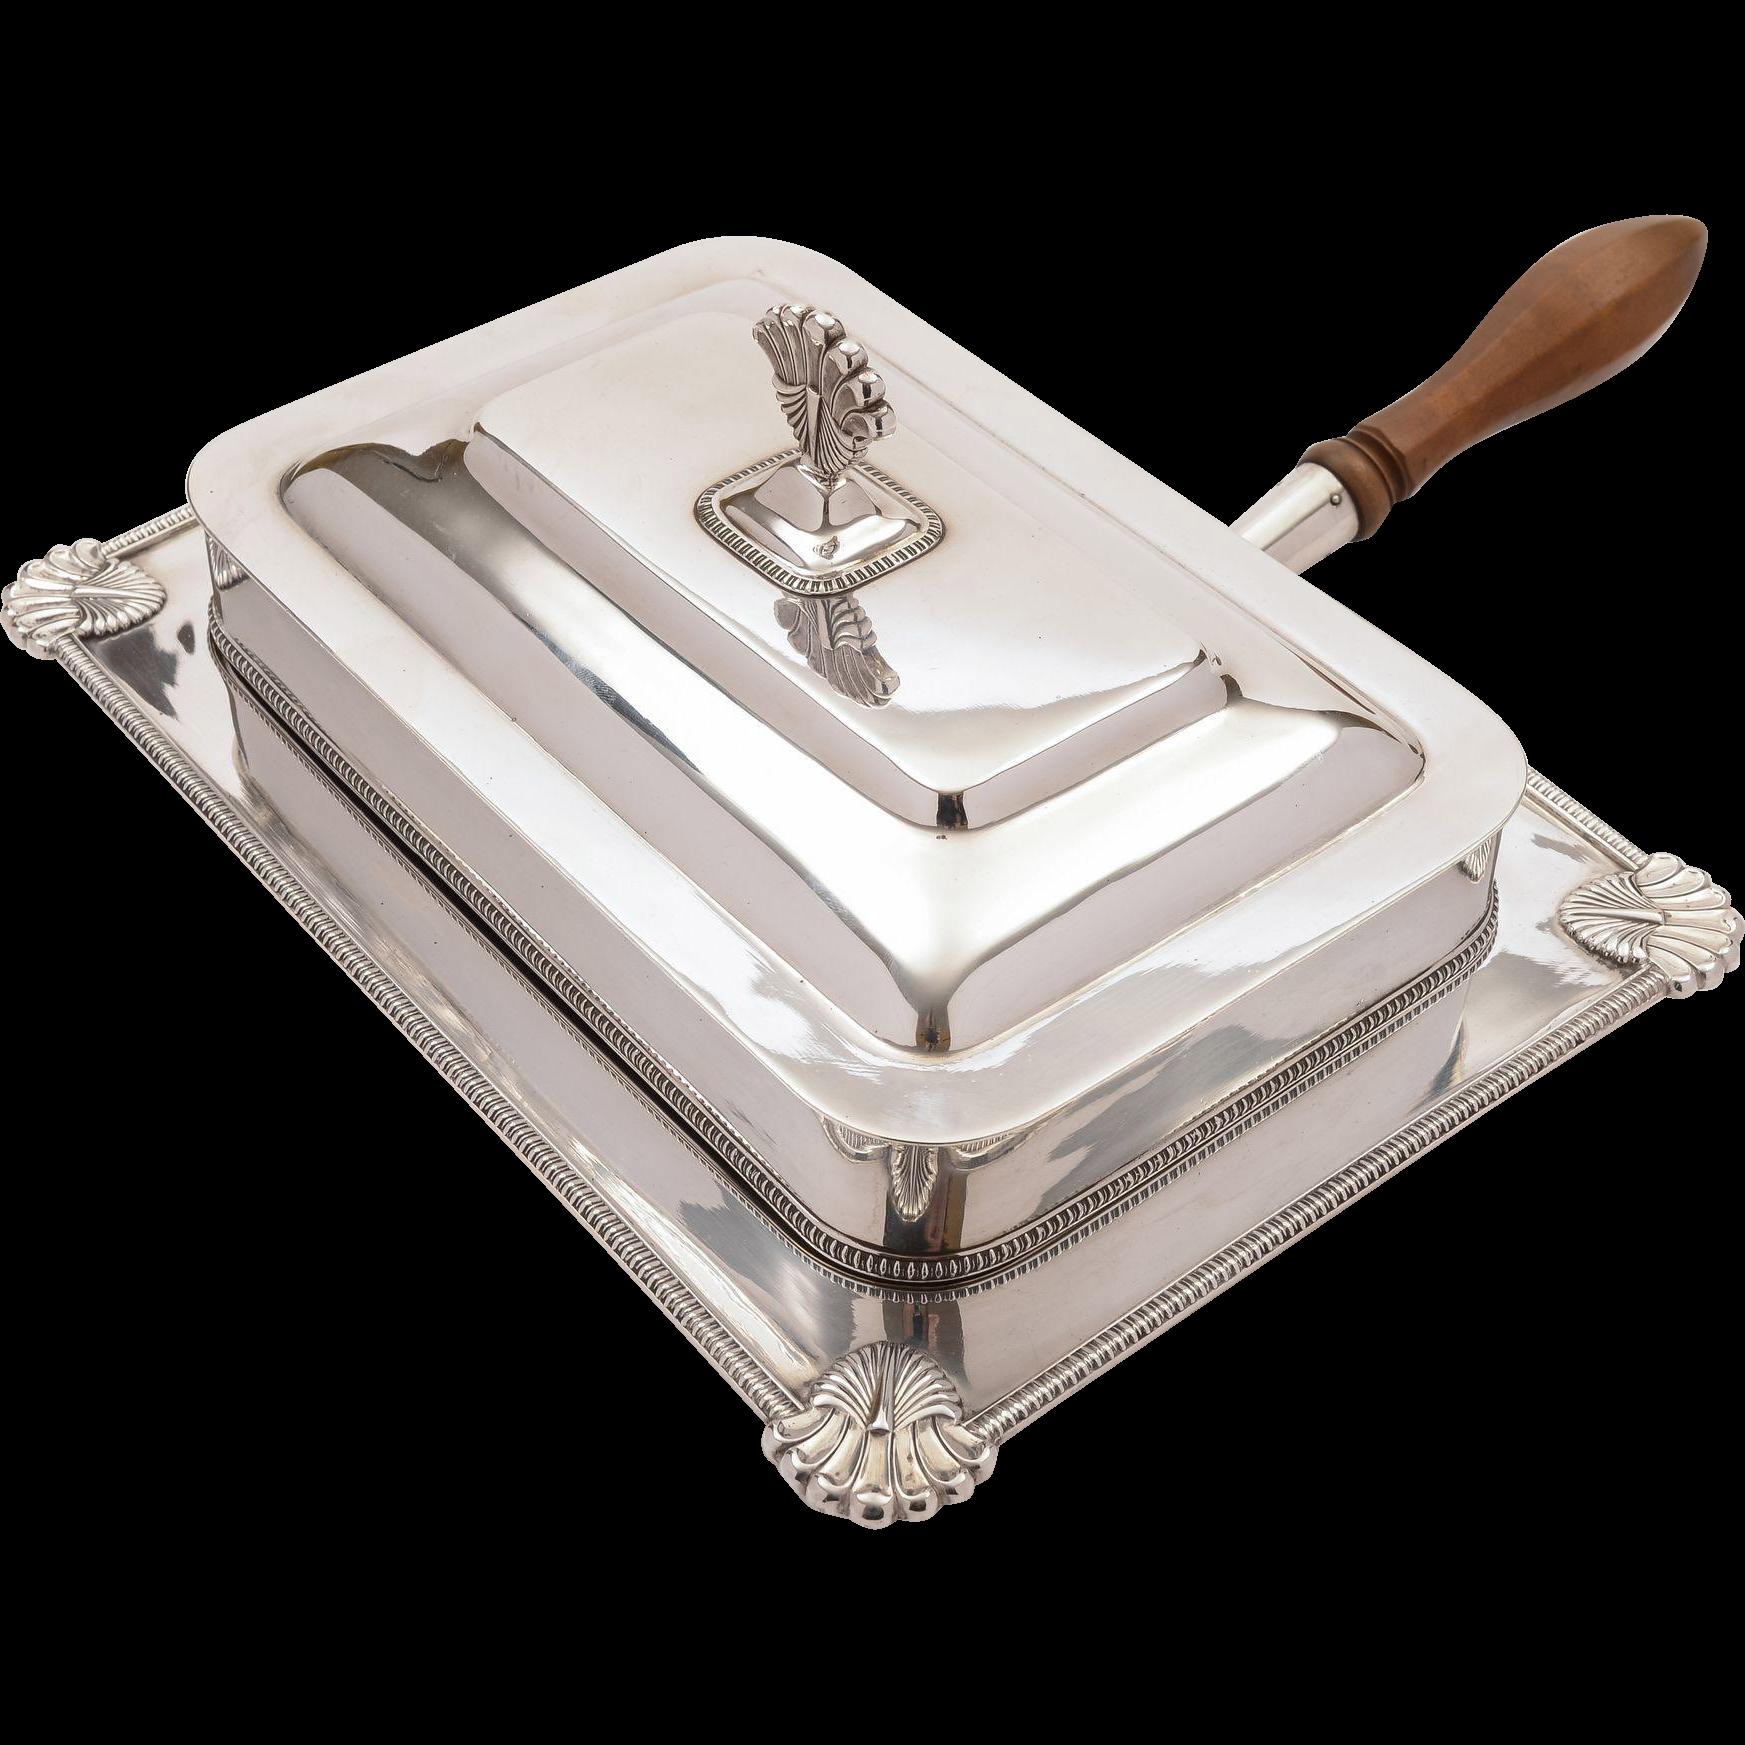 Edwardian Silver Plated Serving Dish, Circa 1905